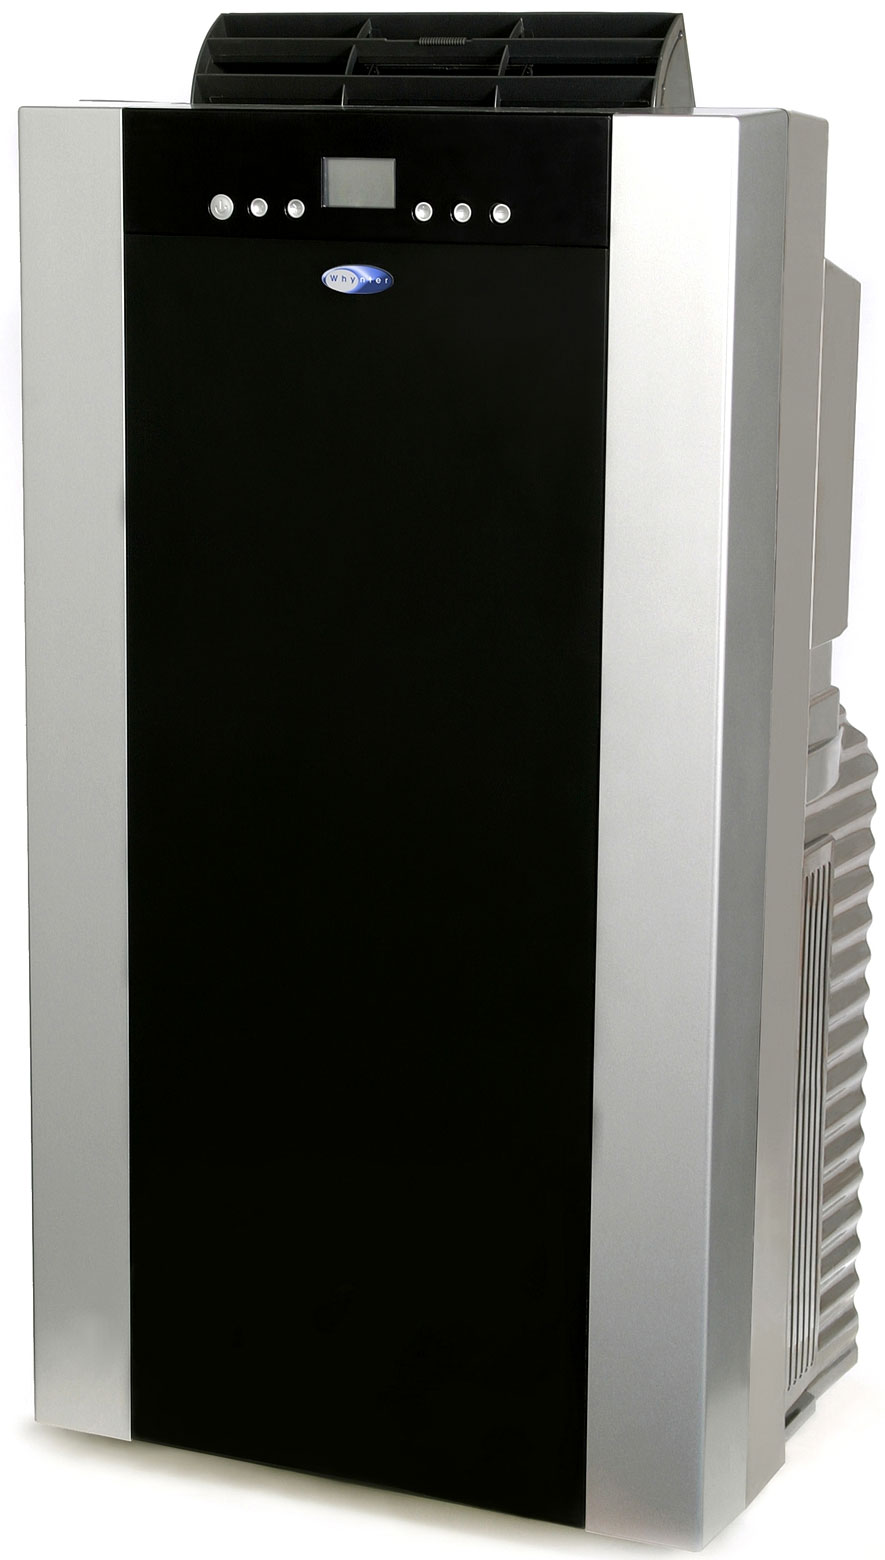 14 000 Btu Portable Air Conditioner 14000 Btu Whynter Arc 14s